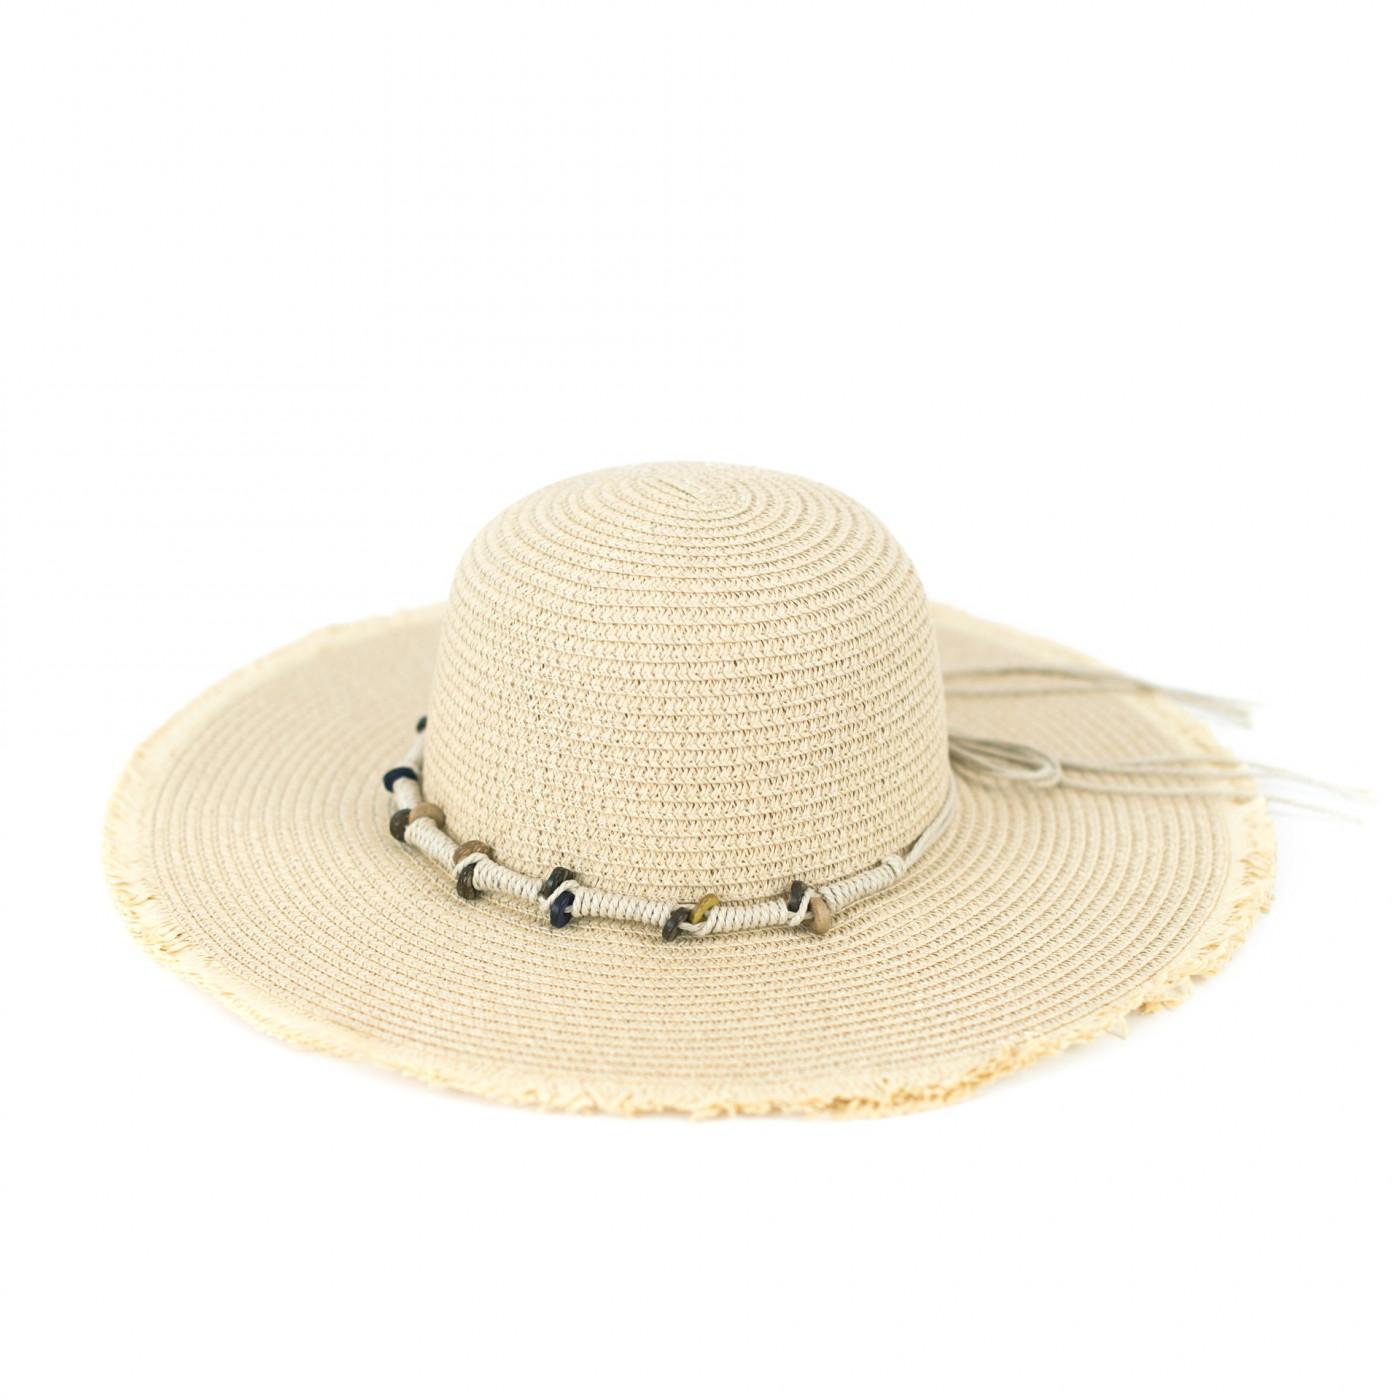 Art Of Polo Woman's Hat cz19224